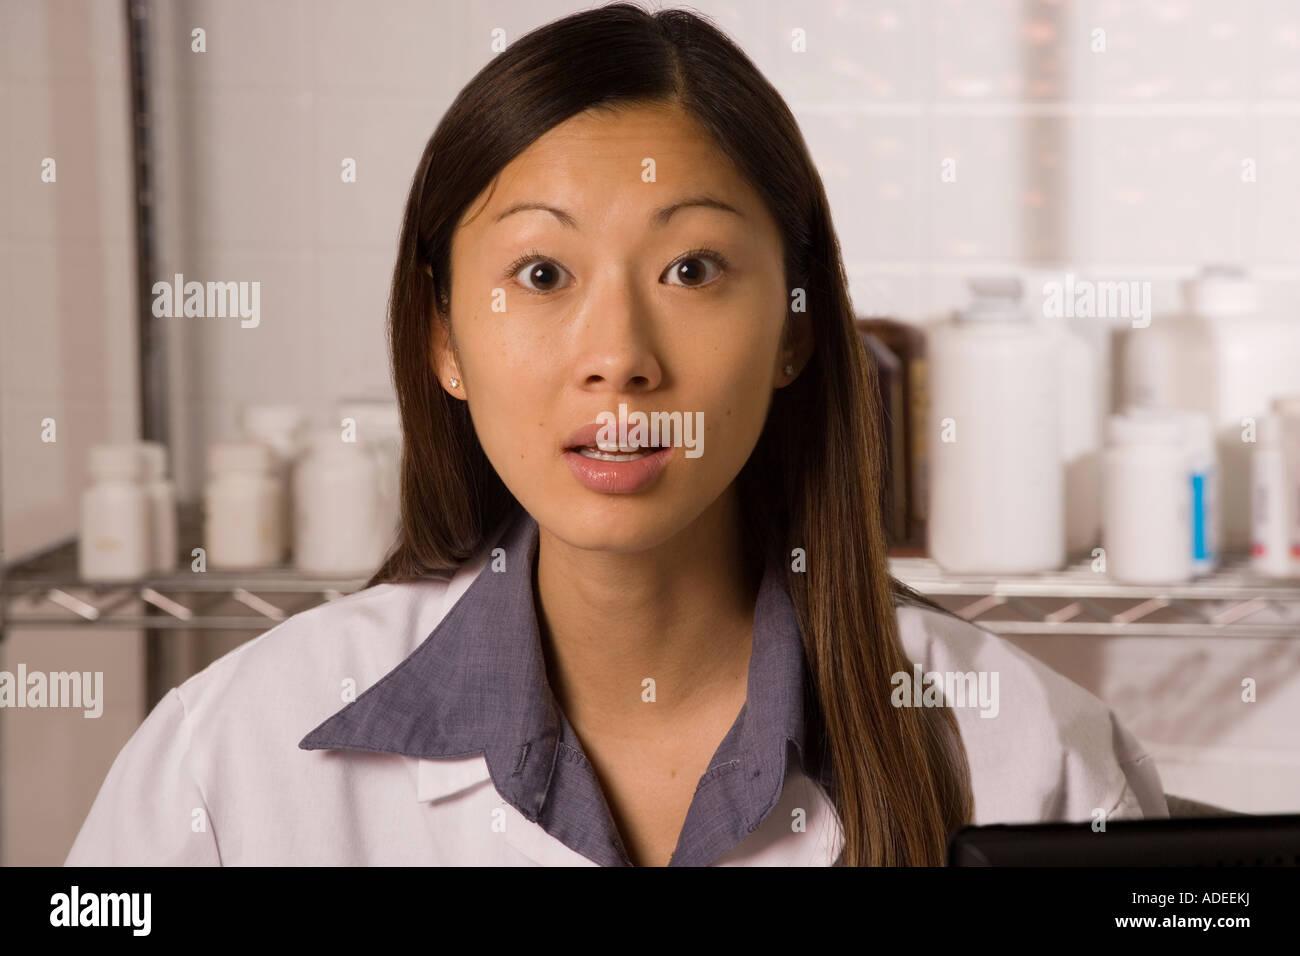 Pharmacist in the hospital pharmacy. - Stock Image